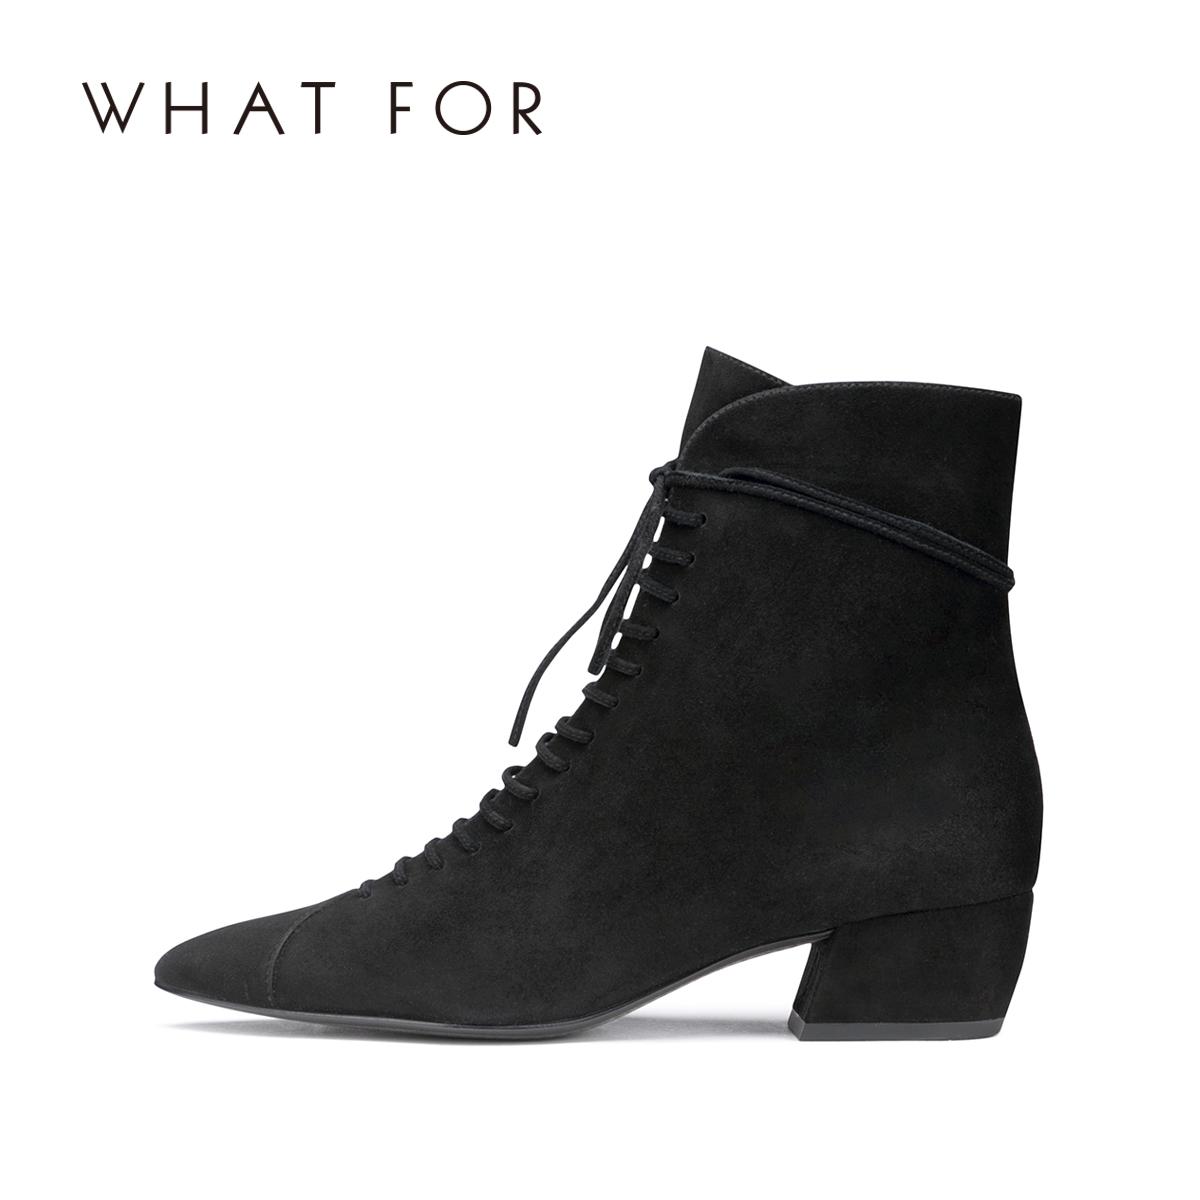 WHAT FOR2018秋冬新款羊反毛尖头简约中跟粗跟短筒靴子女短靴踝靴